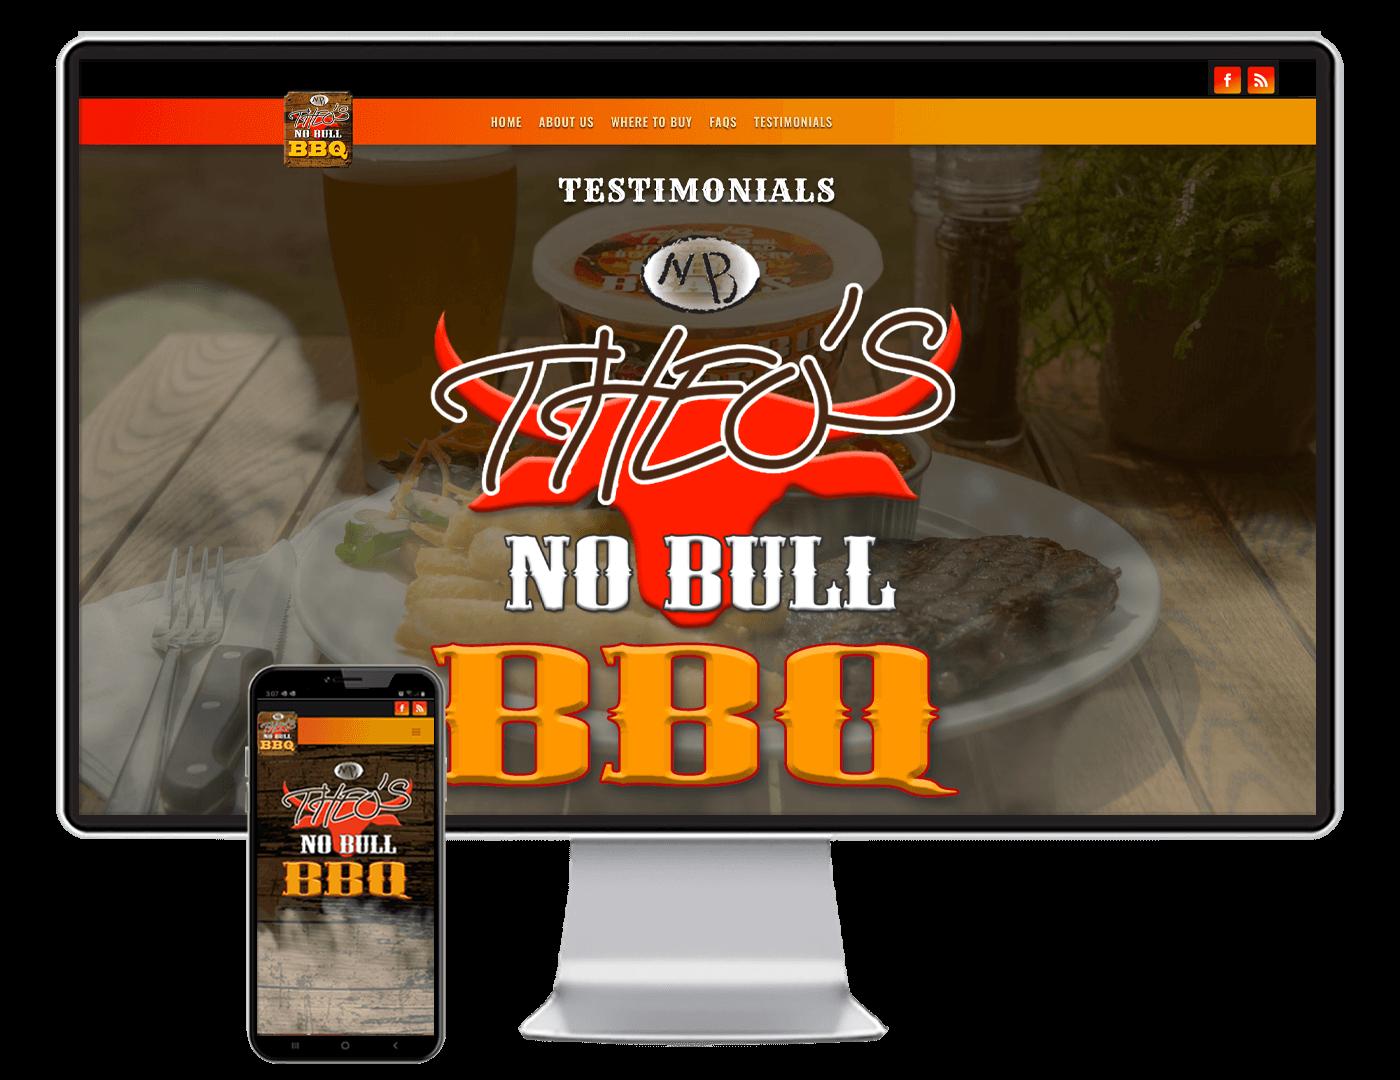 Theos No Bull BBQ